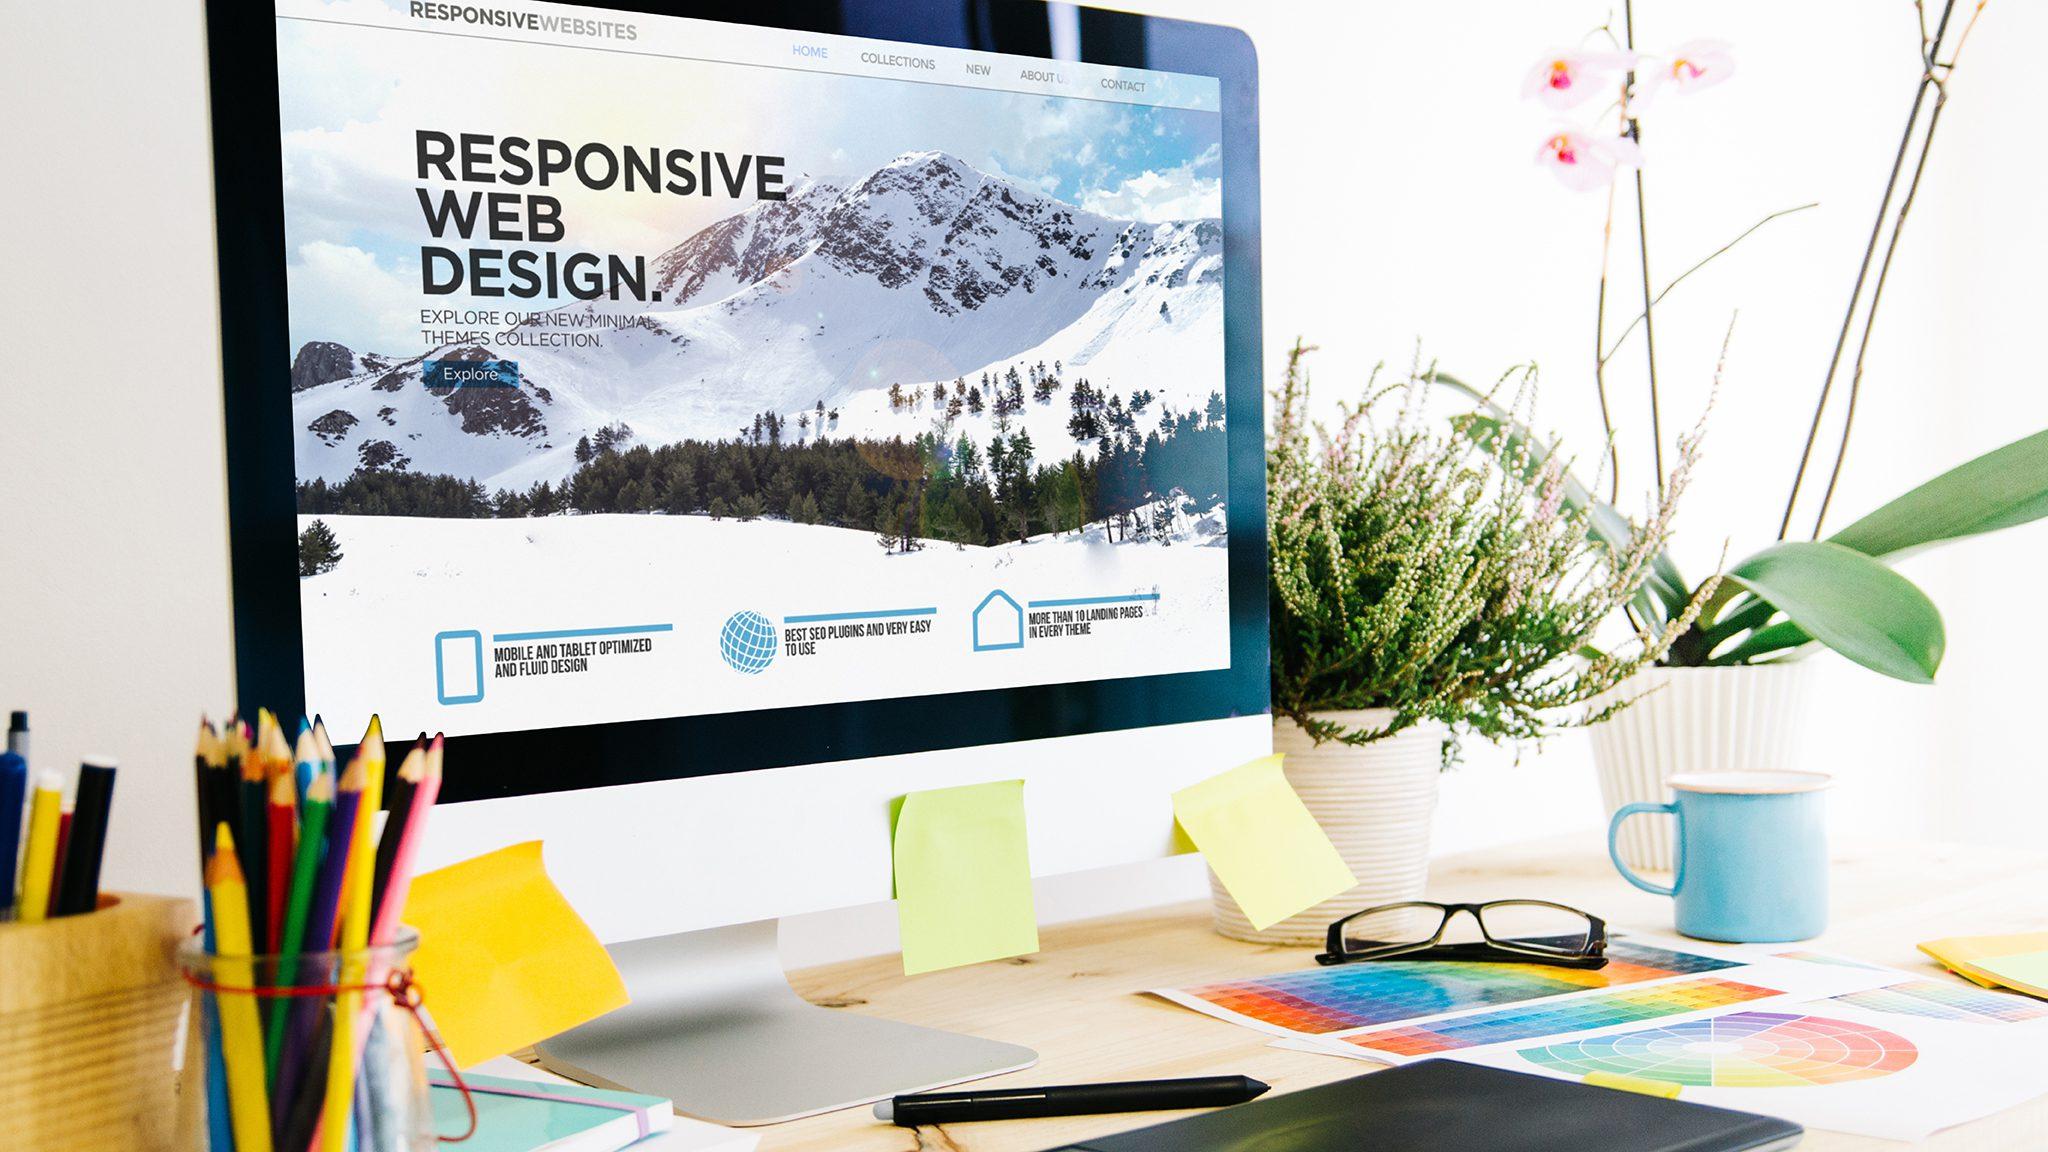 NeueMedien - Internet Webseiten FREY PRINT+MEDIA - Quelle: MclittleStock (207255045) - stock.adobe.com